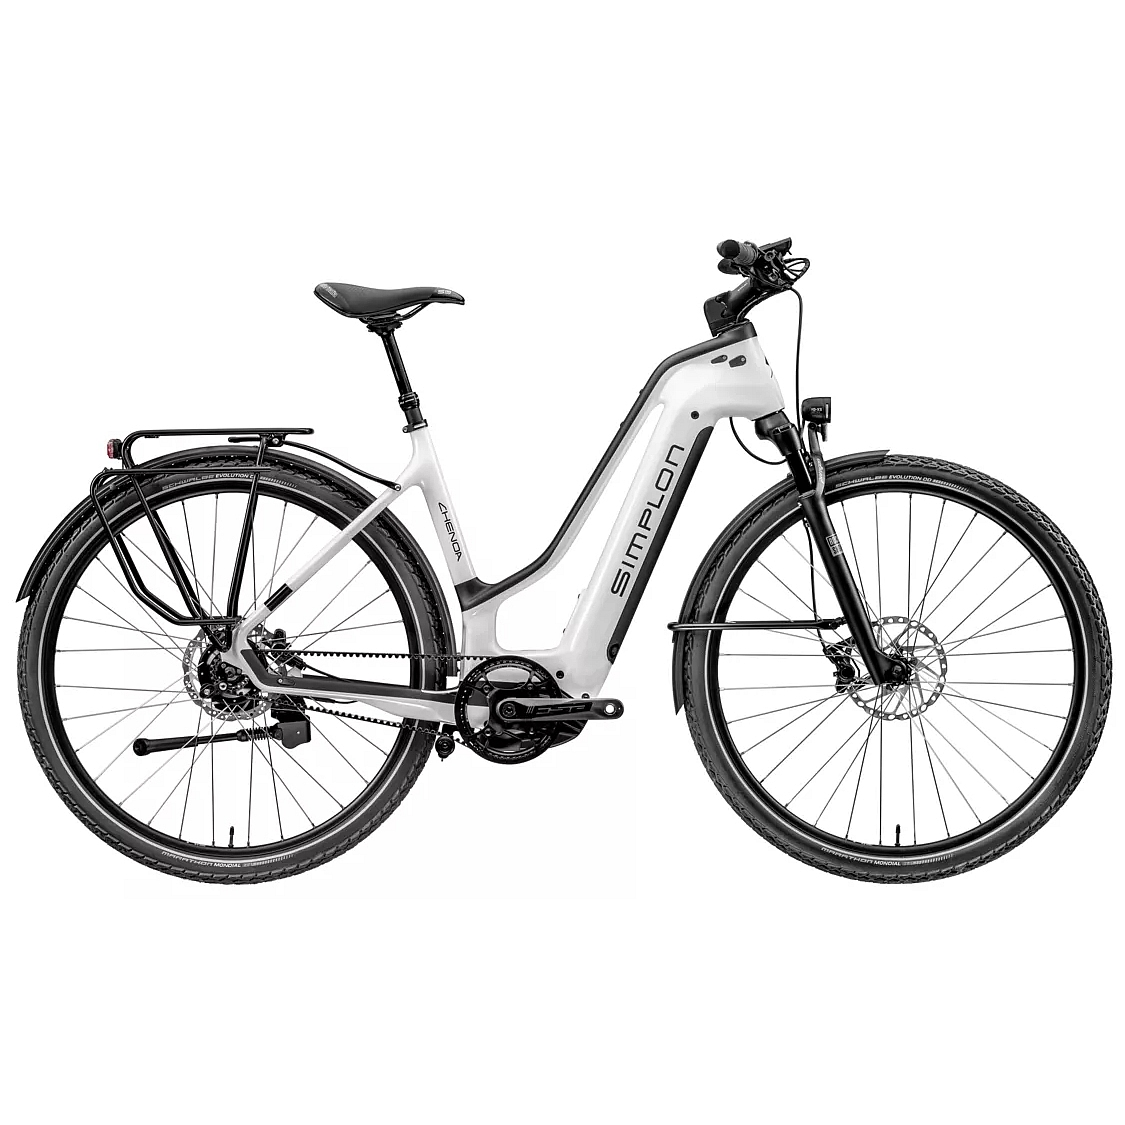 Produktbild von Simplon CHENOA CX Deore11 - Damen E-Bike - 2021 - pearlwhite